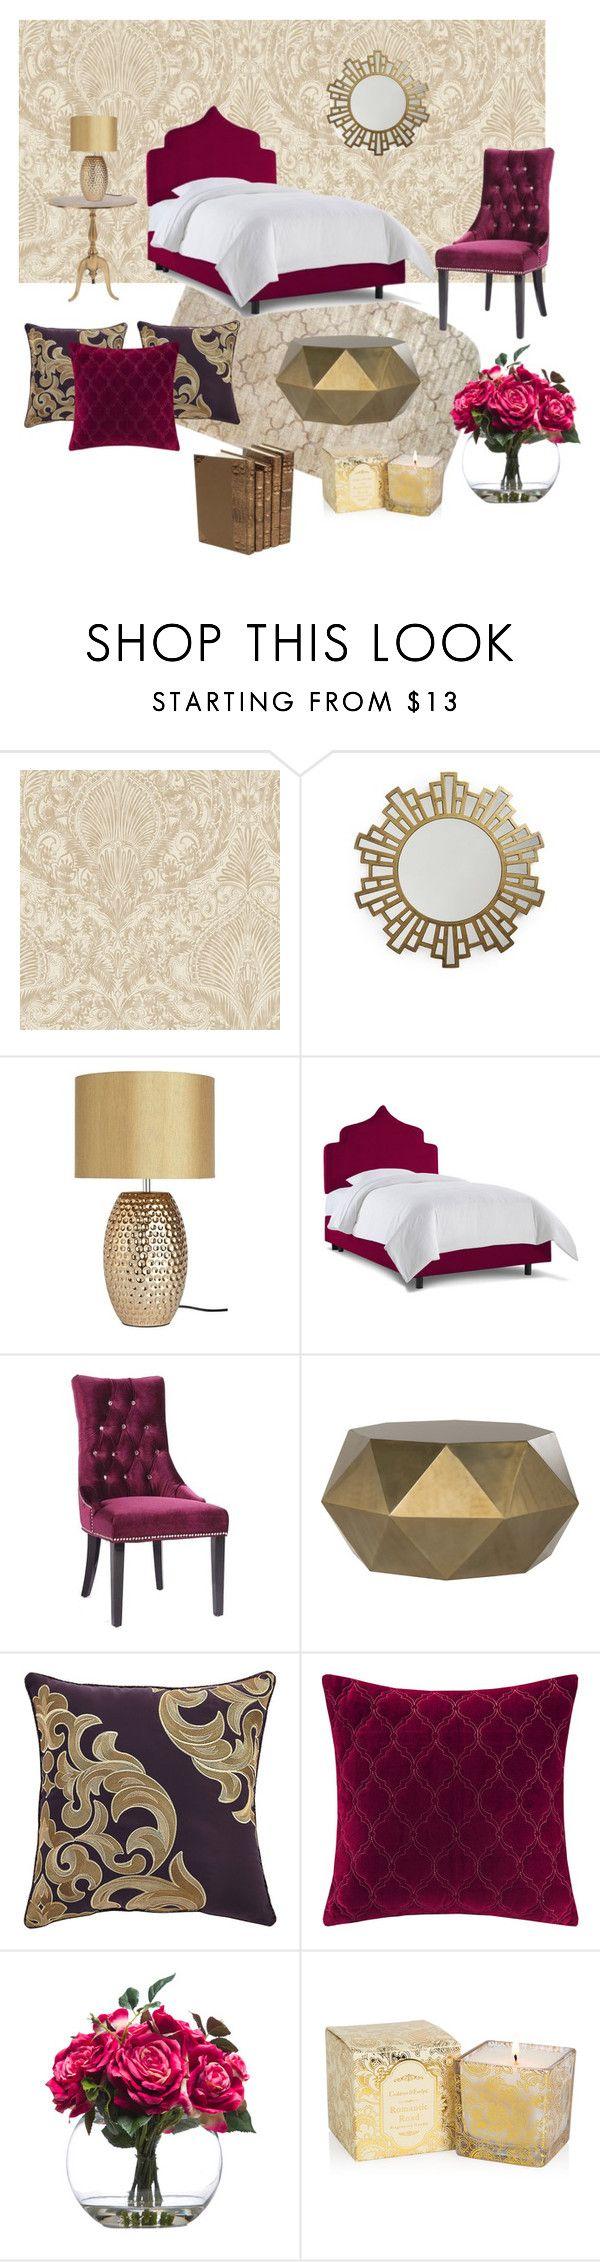 """Untitled #36"" by reetta-v on Polyvore featuring interior, interiors, interior design, home, home decor, interior decorating, Era Home, Armen Living, Croscill and Madison Park"